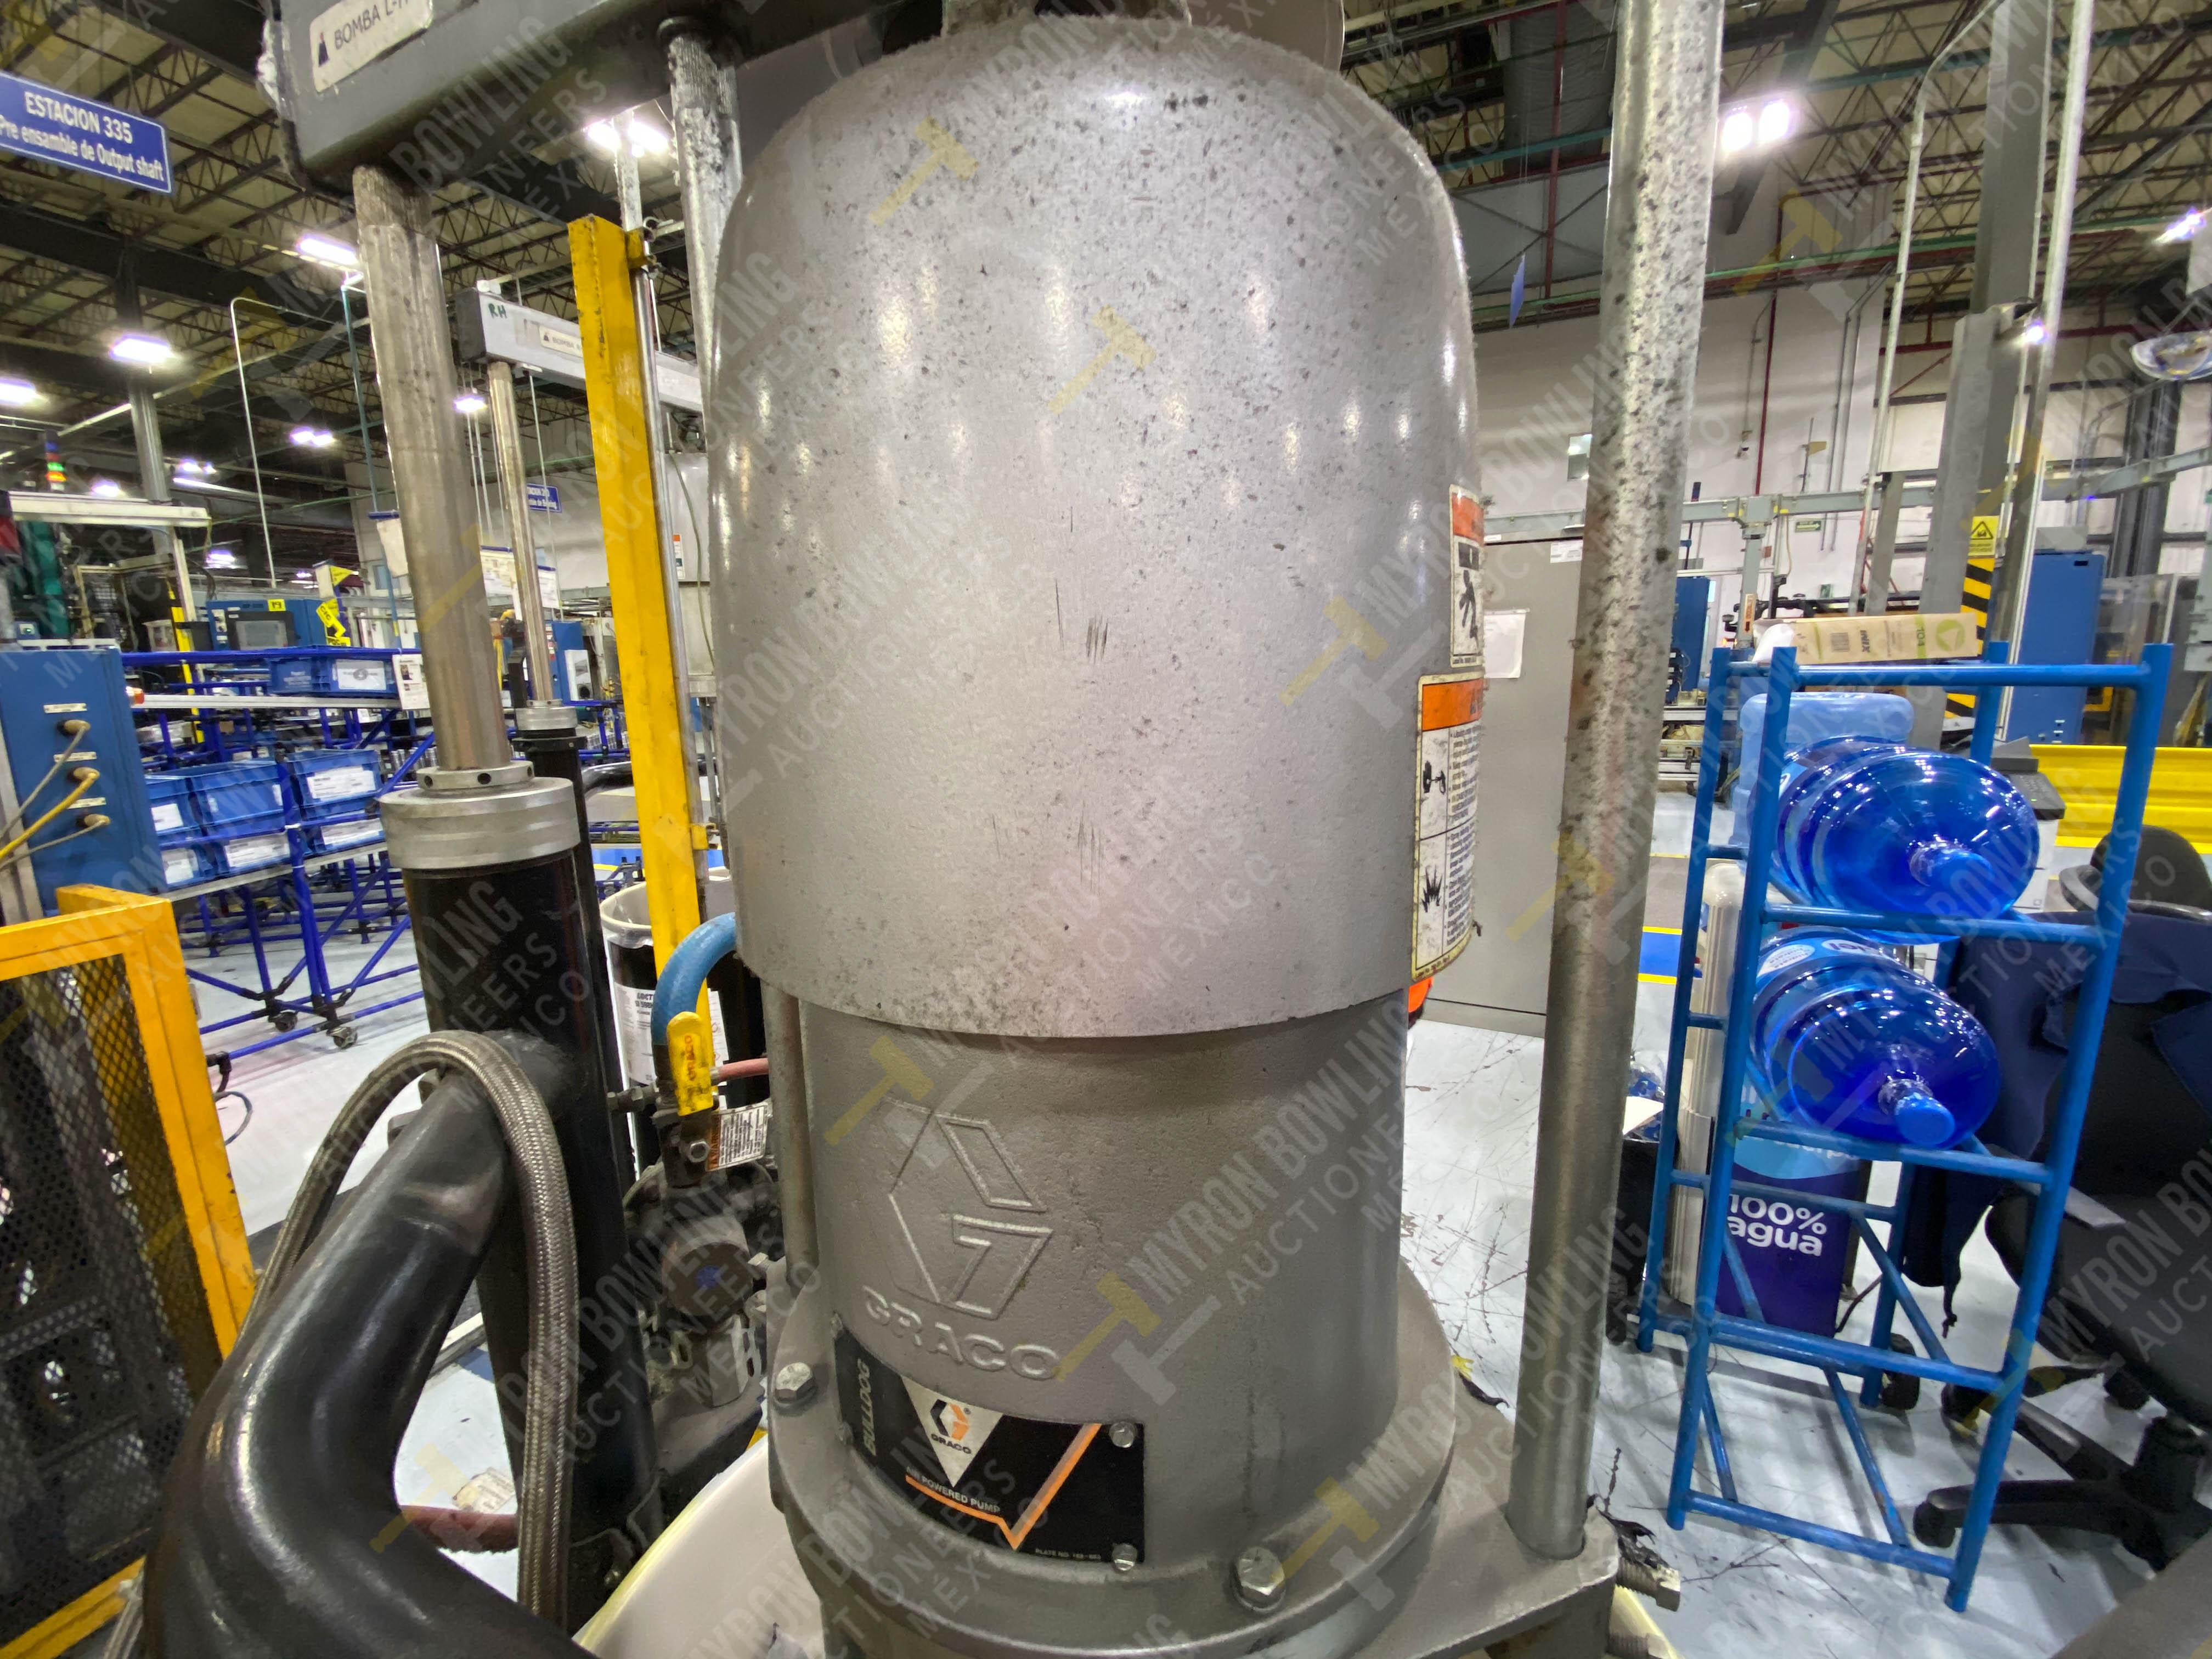 Dos sistemas de dispensador de sellador RTV (bombas) marca Graco Bulldog, 8.3 L/min max - Image 3 of 12